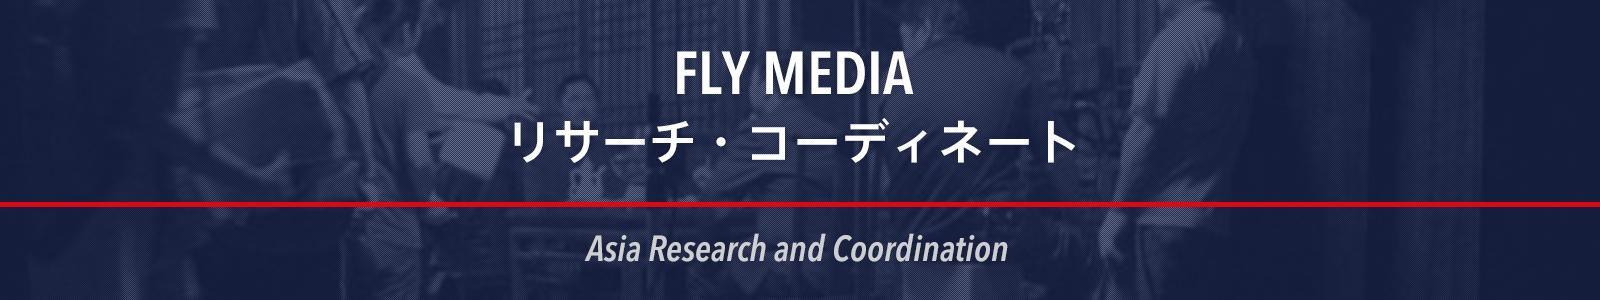 FLY MEDIA リサーチ・撮影コーディネート